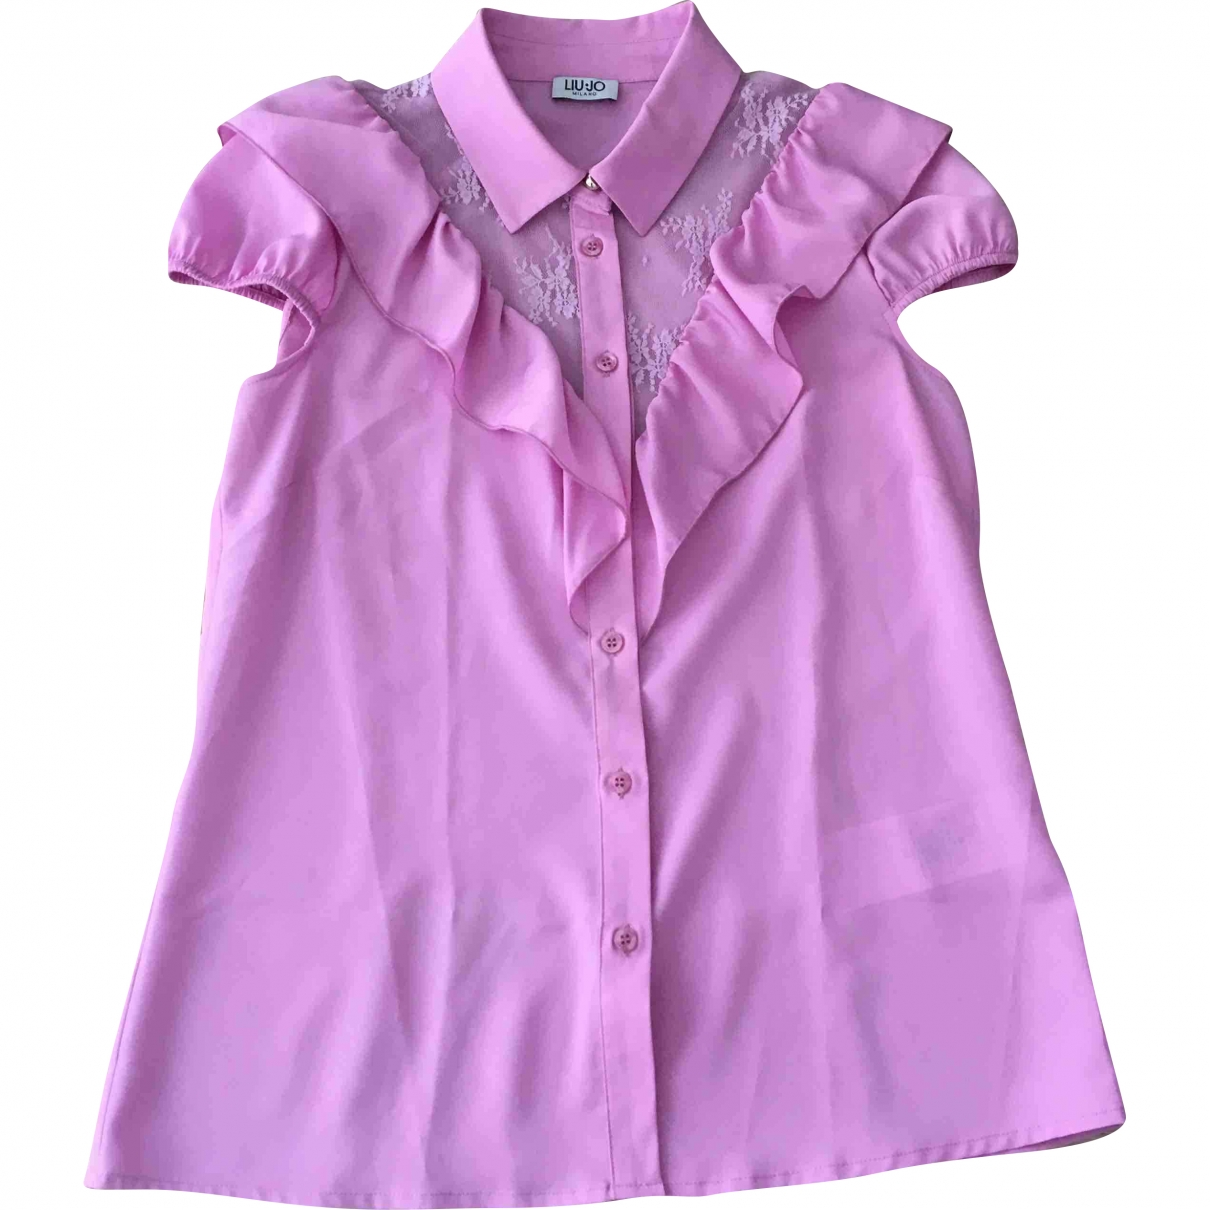 Liu.jo - Top   pour femme - rose